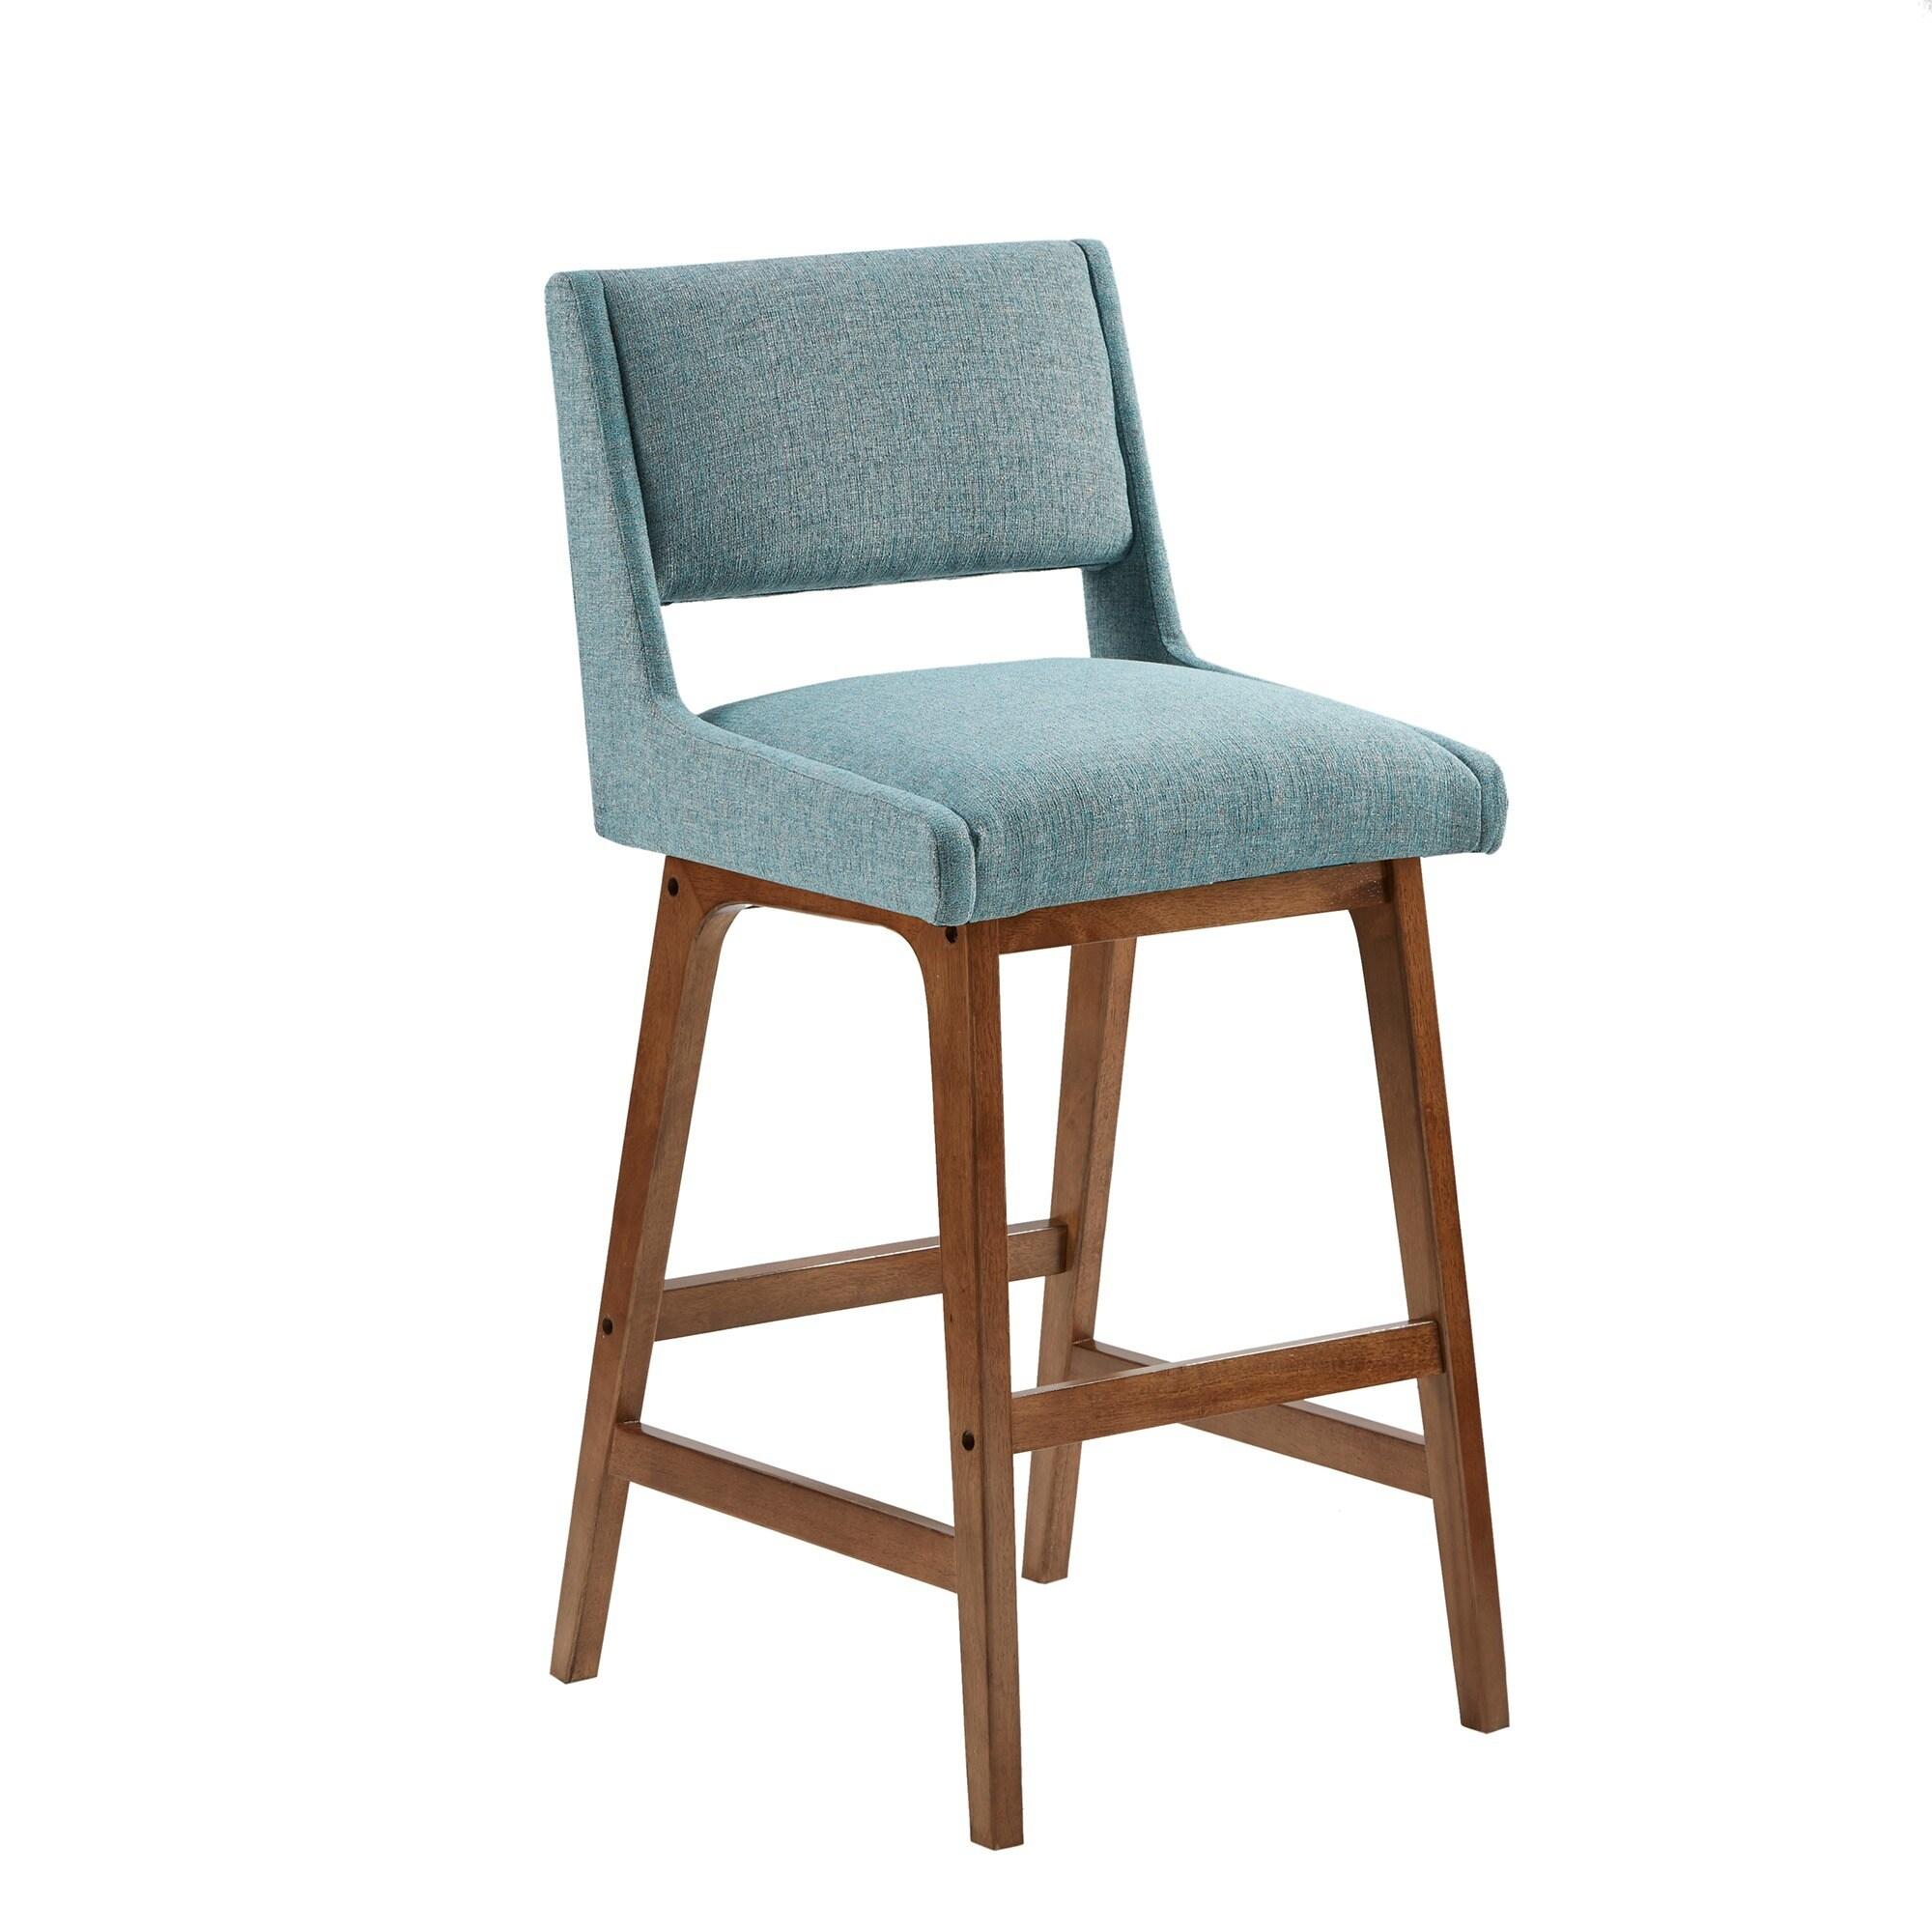 bar today stools linon shipping agatha laurel bridgeport product creek stool blue garden overstock free home